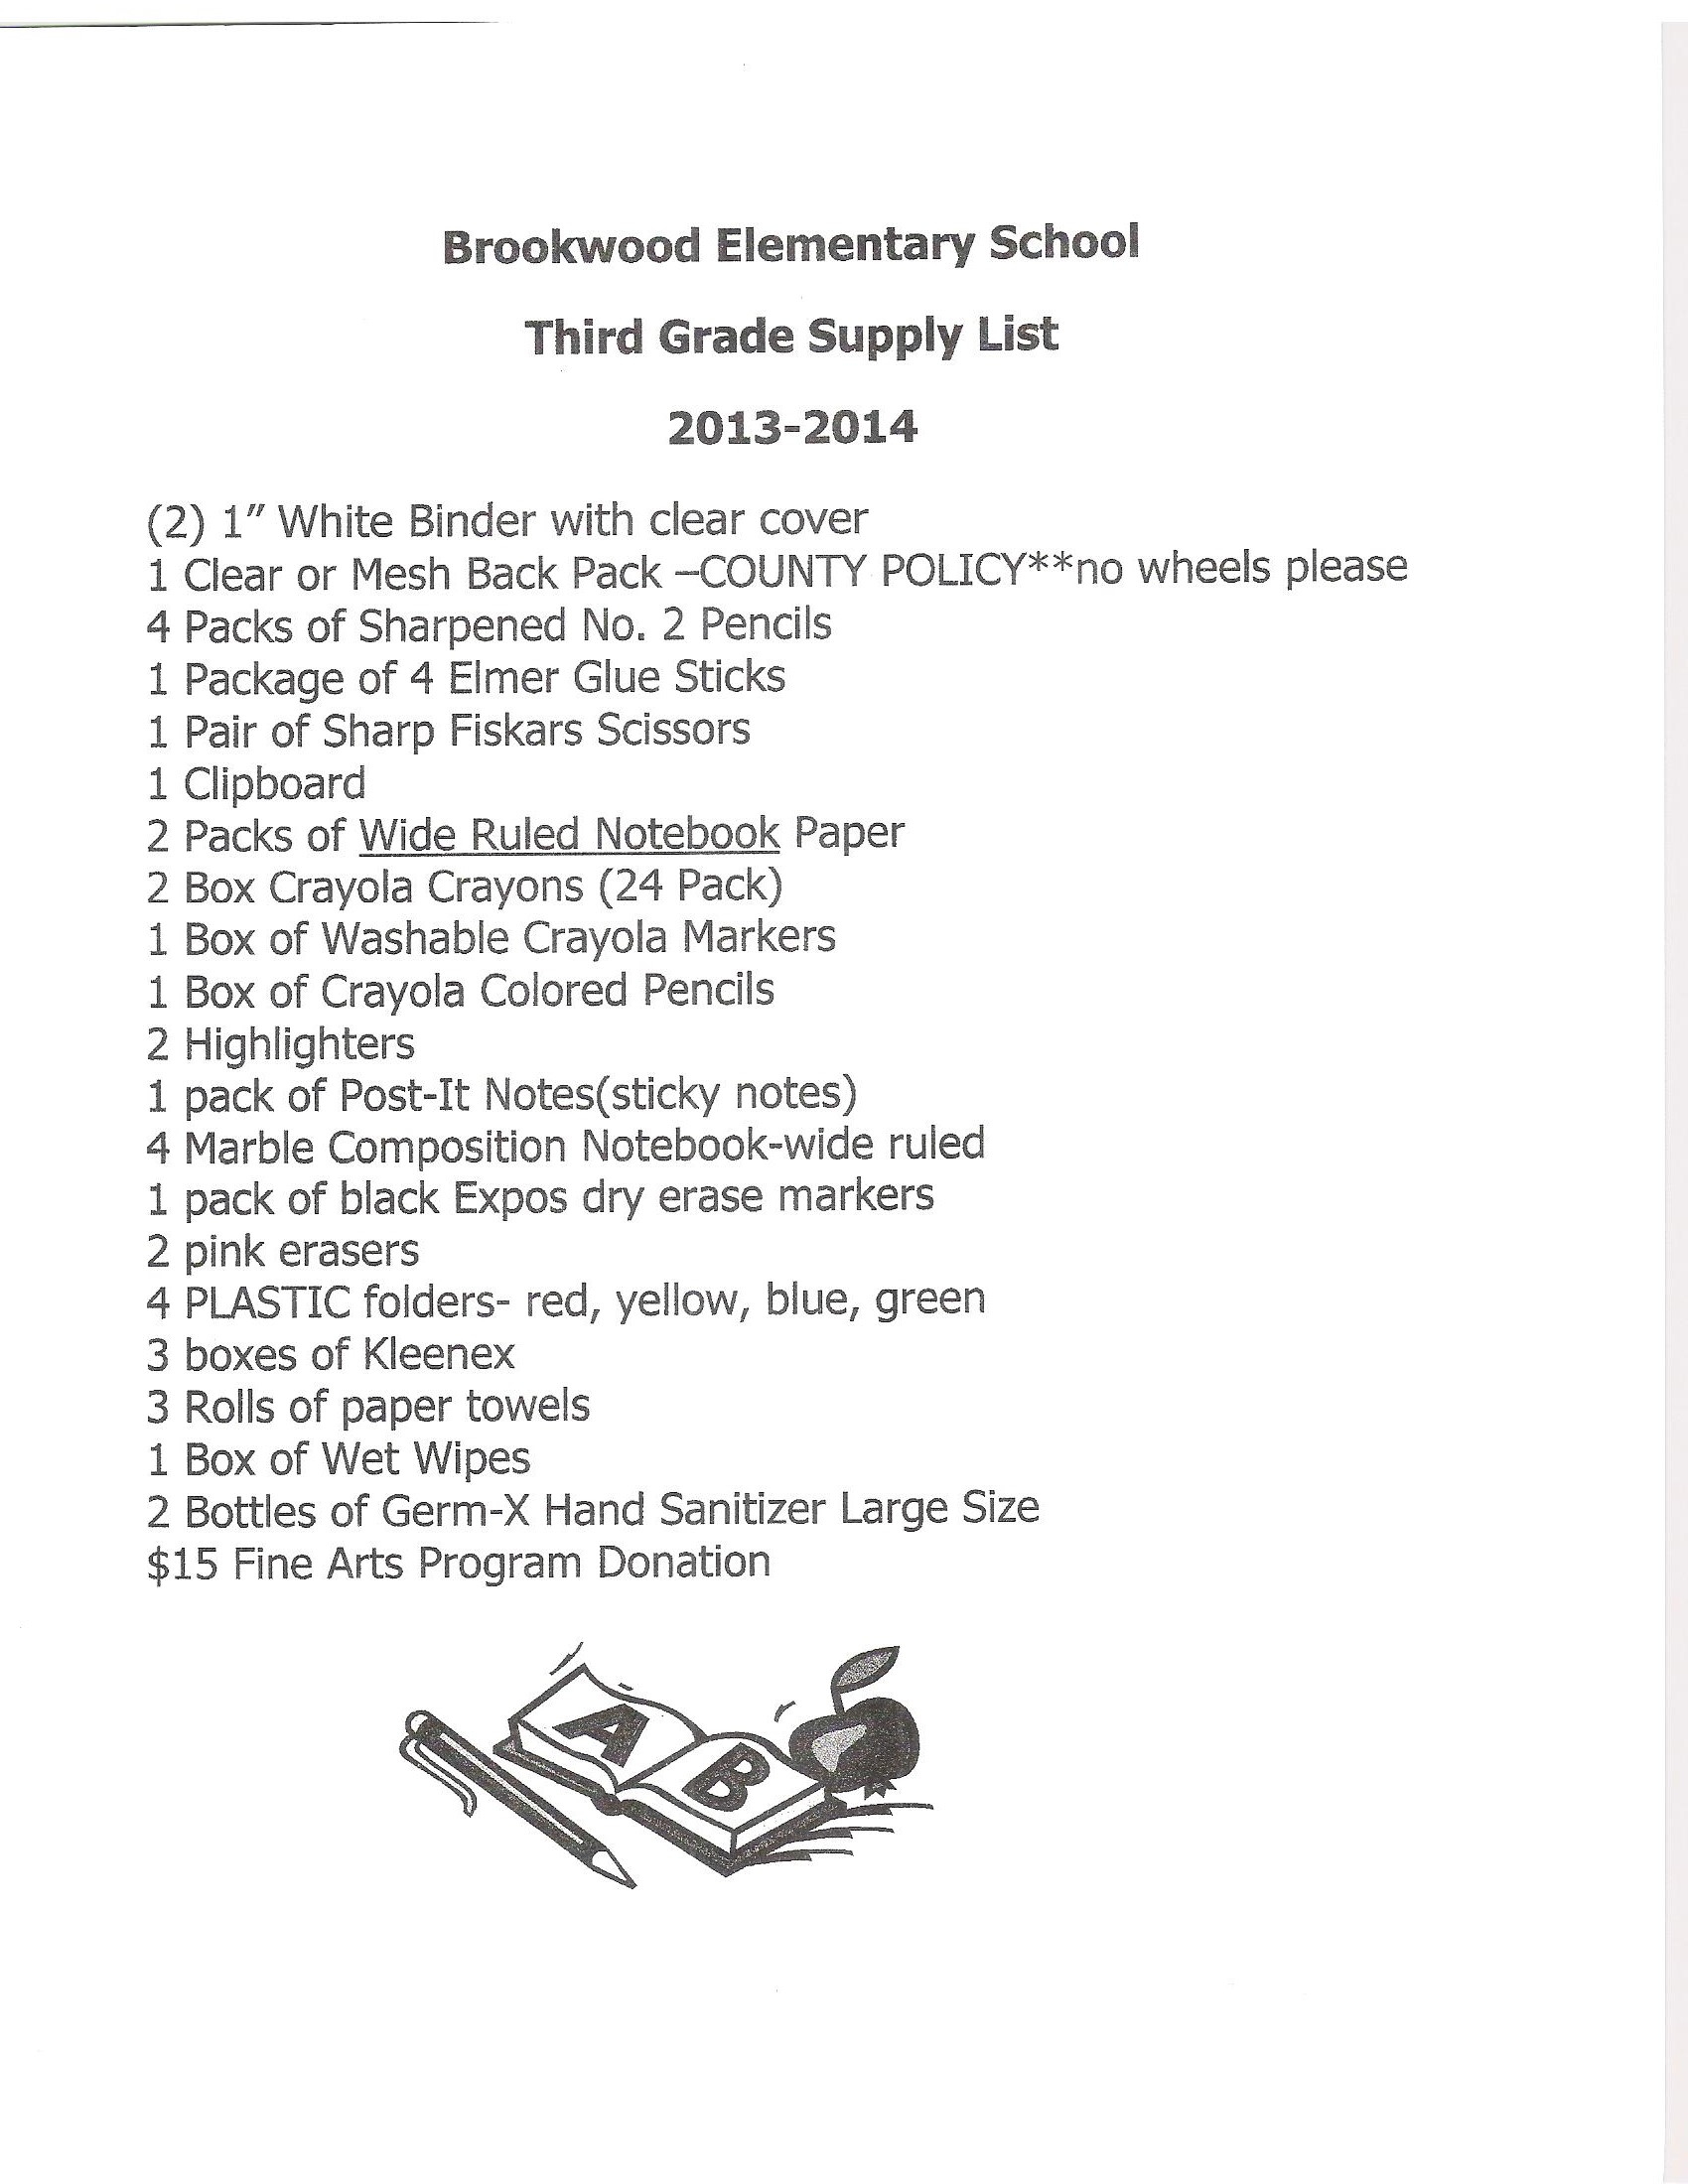 Supply List Supply Lists